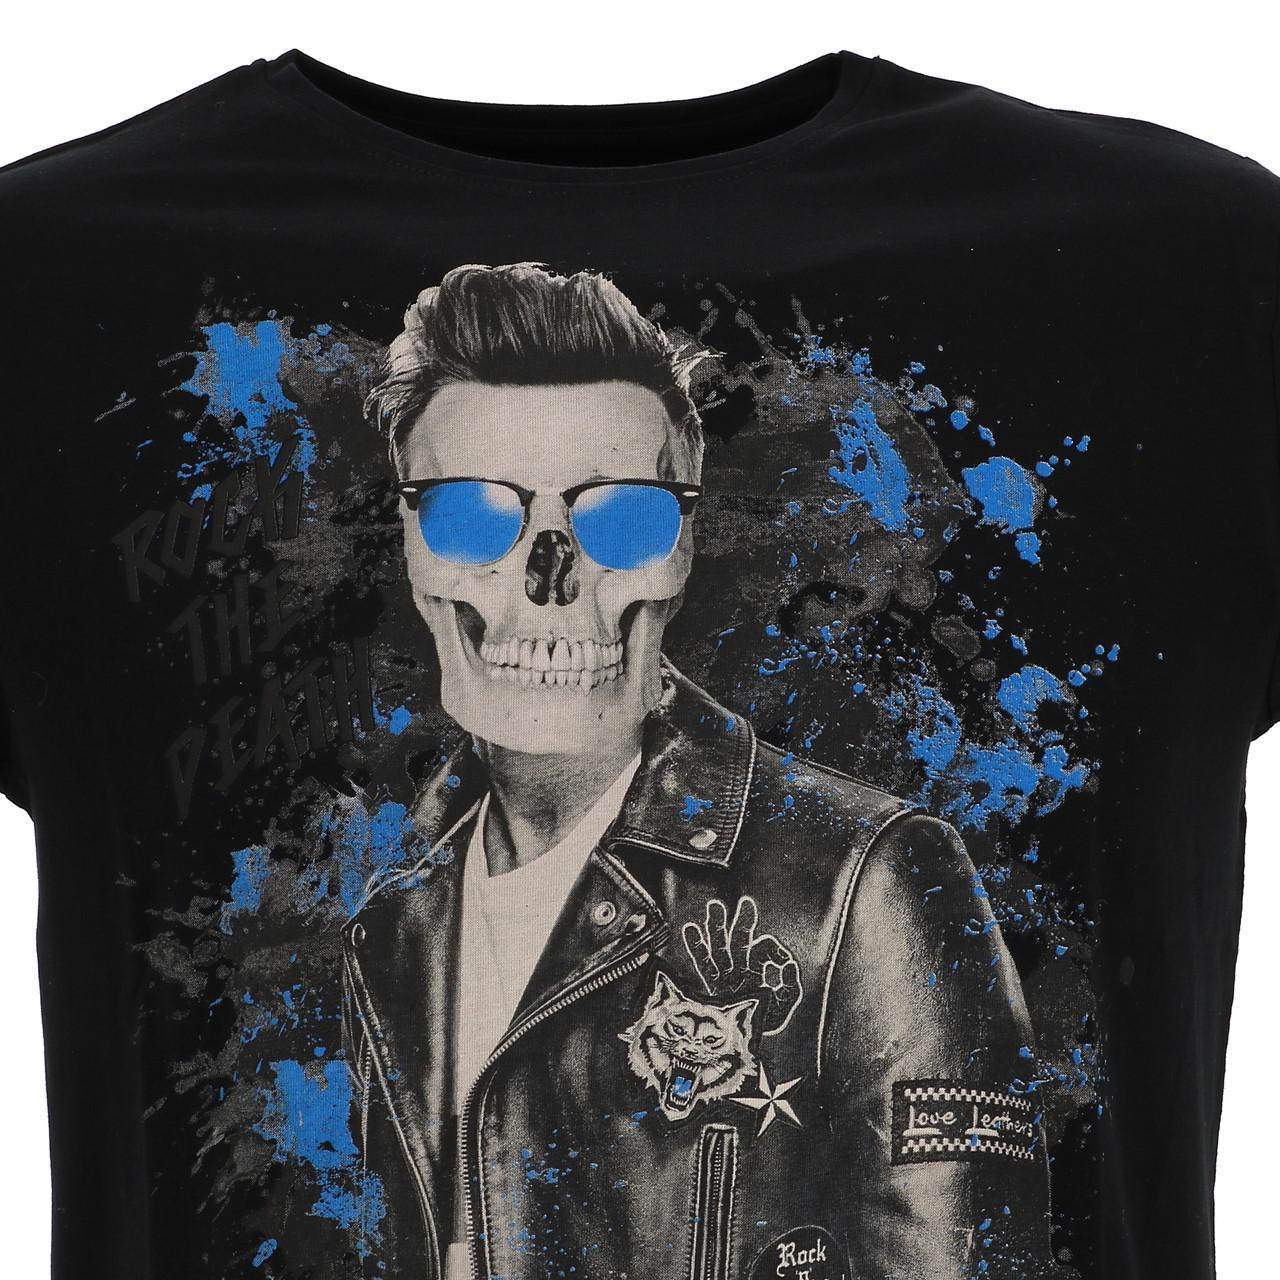 Short-Sleeve-T-Shirt-Paname-Brothers-Merico-Black-Mc-Tee-Black-26749-New thumbnail 2